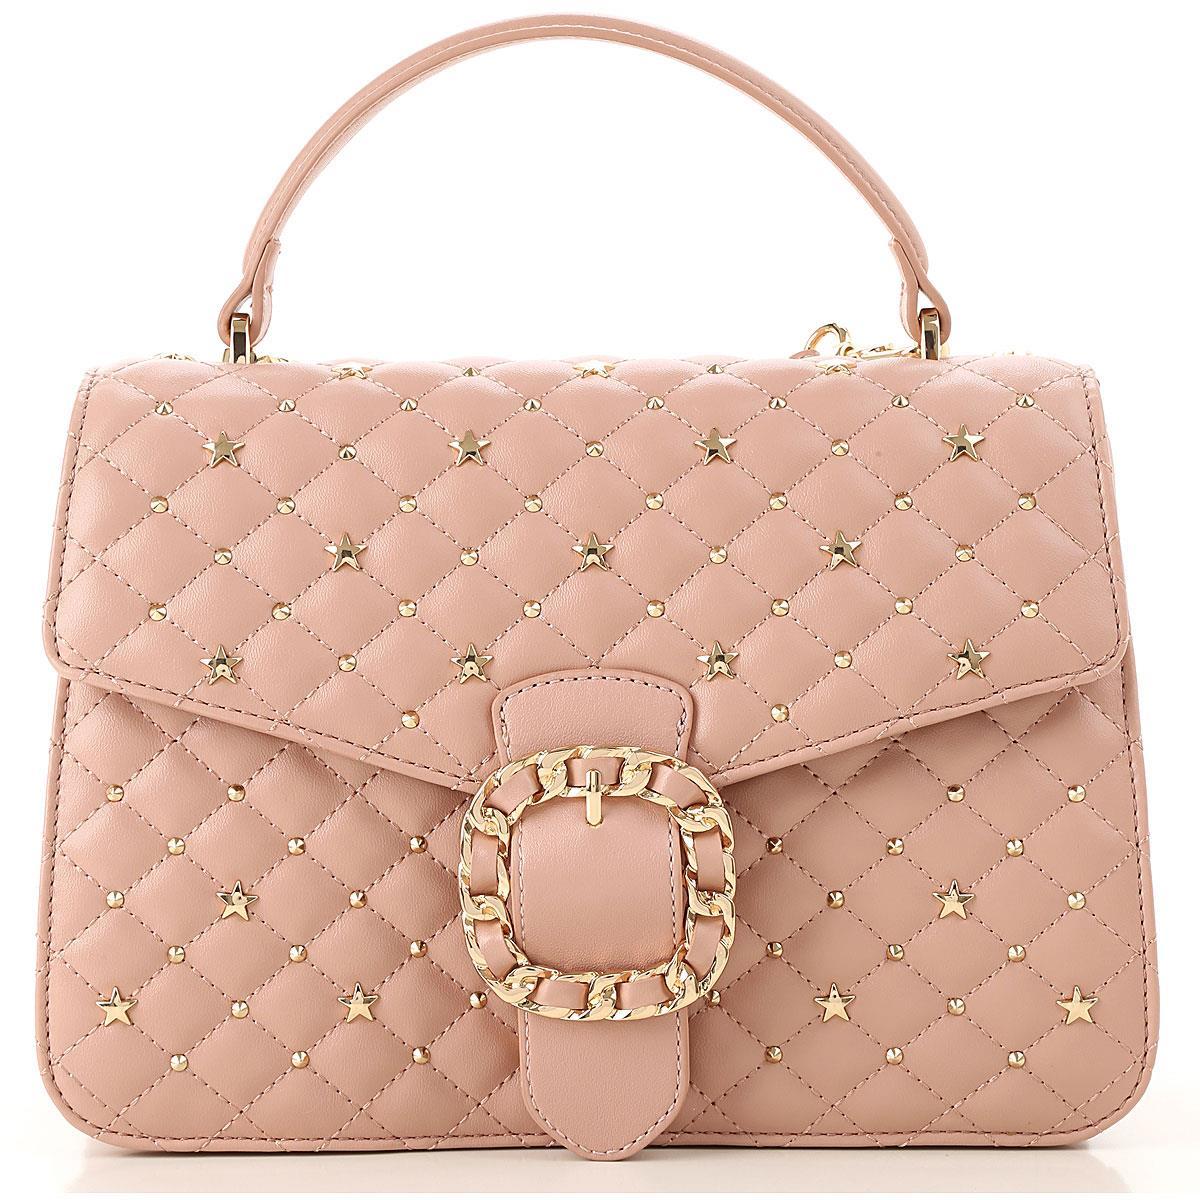 liu-jo-handbag ljohand-a19066e0002-large-1.jpg 8f9646624d8